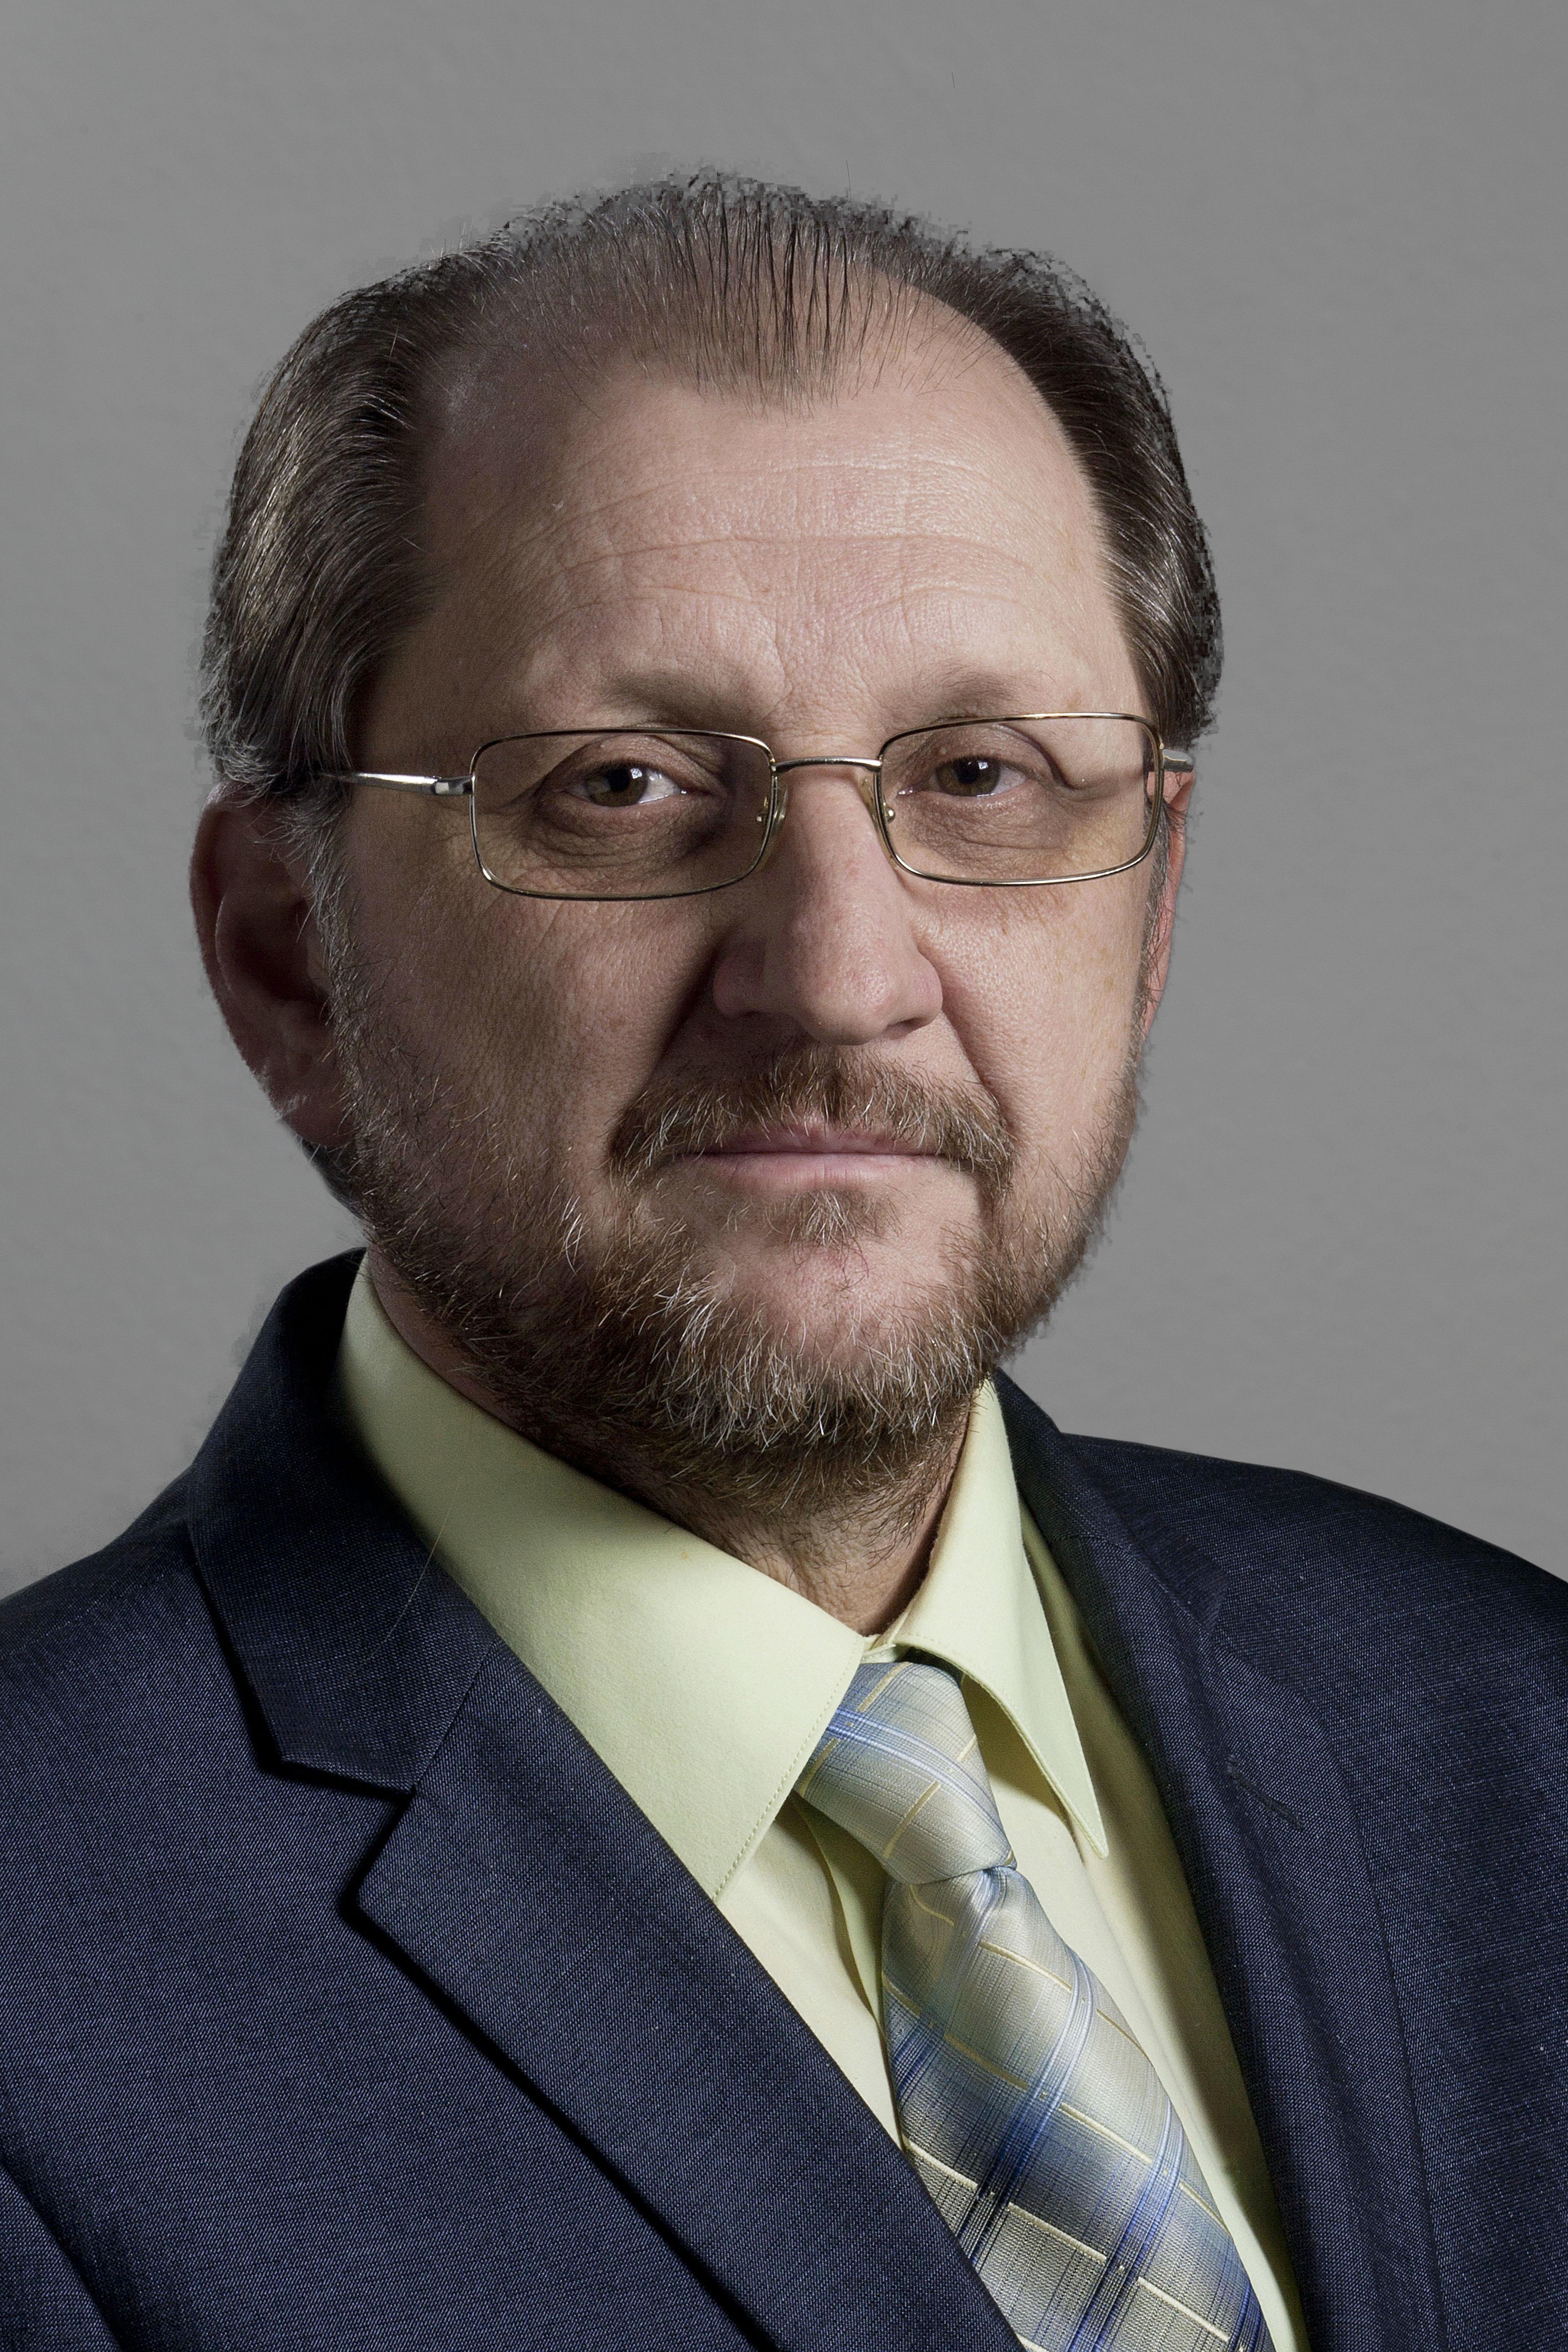 Проф. др Лука Кецман